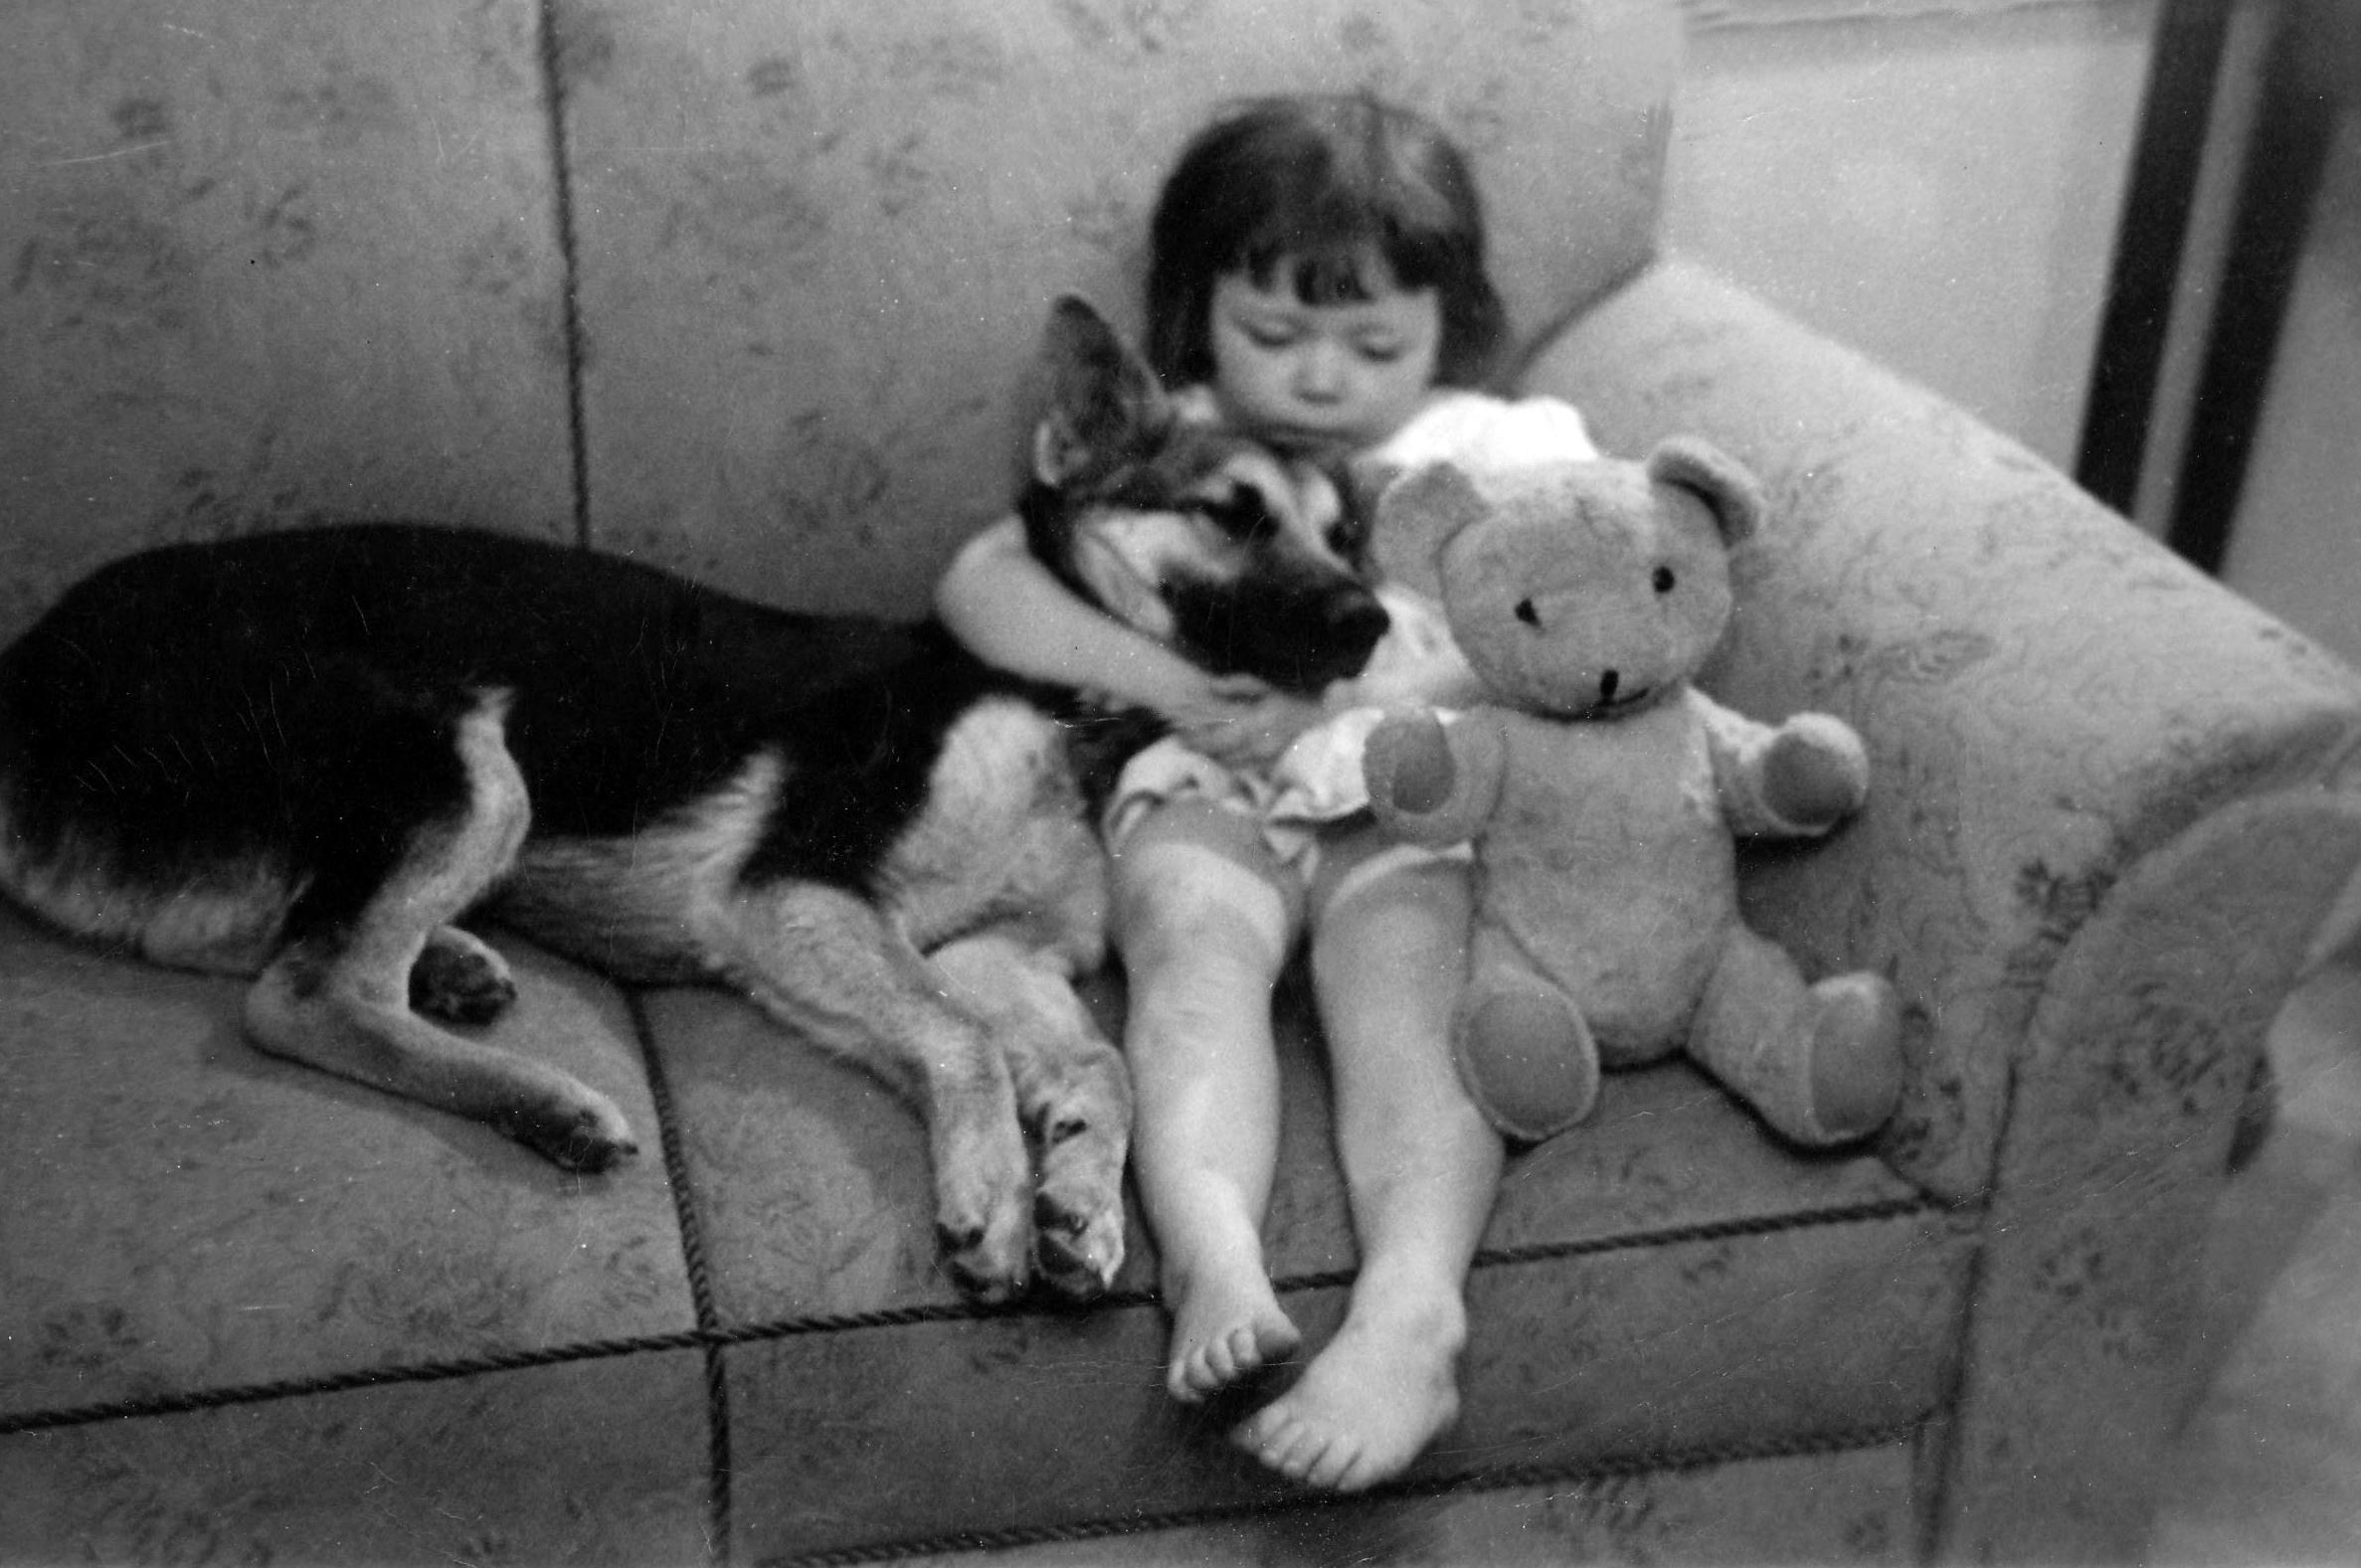 Me and my childhood bear